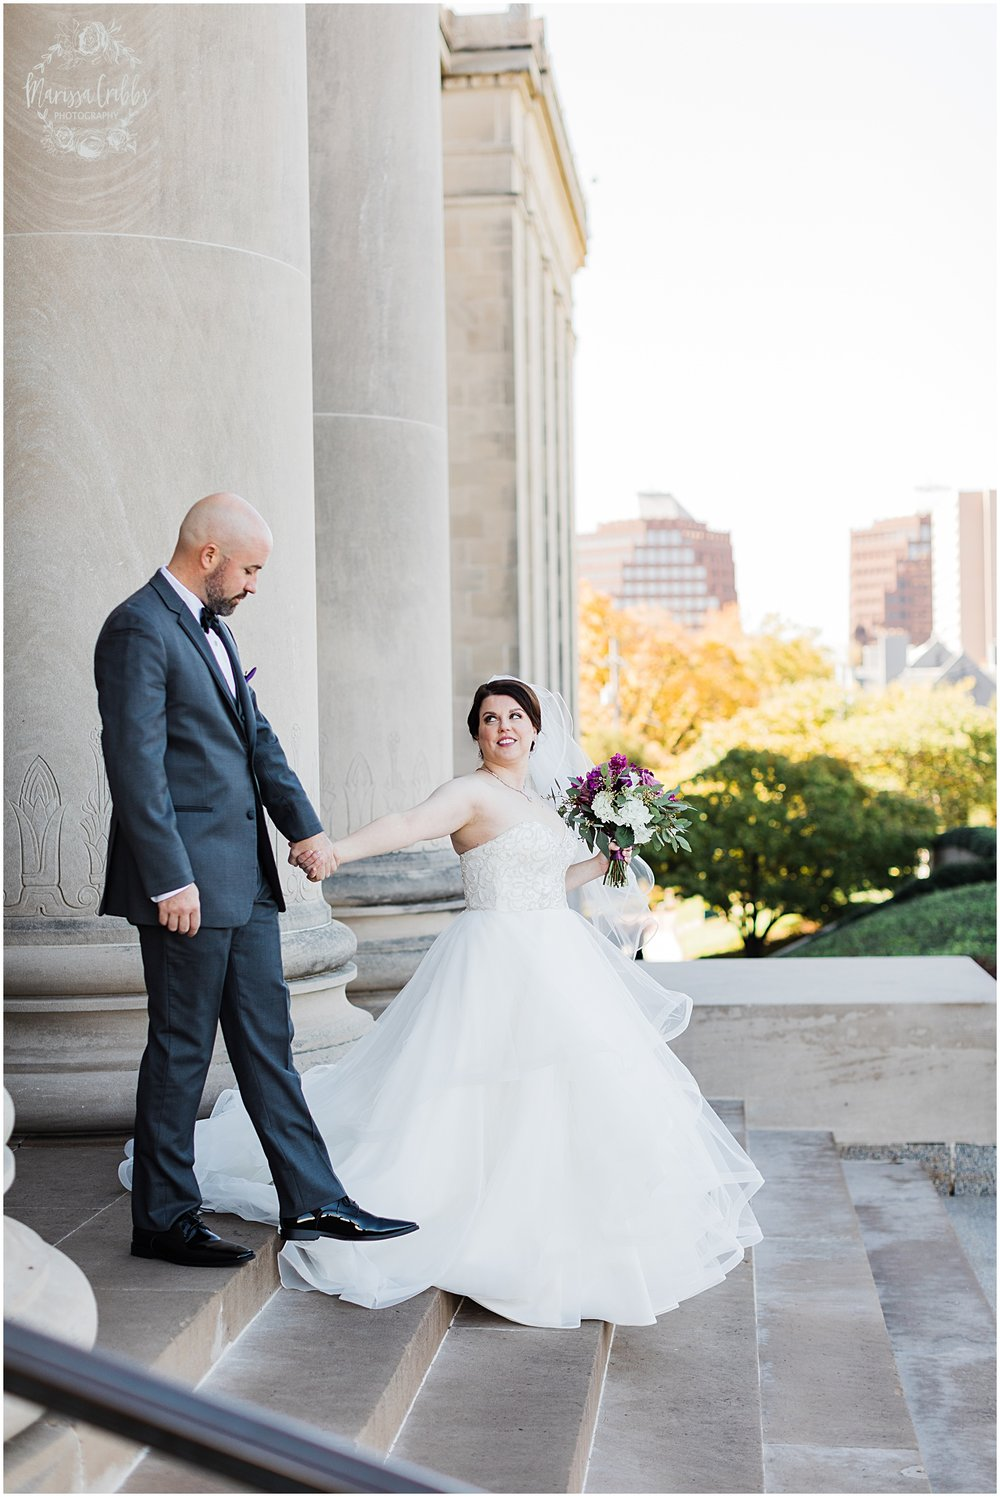 LAURA & DAN MARRIED | NELSON ATKINS MUSEUM | MARISSA CRIBBS PHOTOGRAPHY_7002.jpg